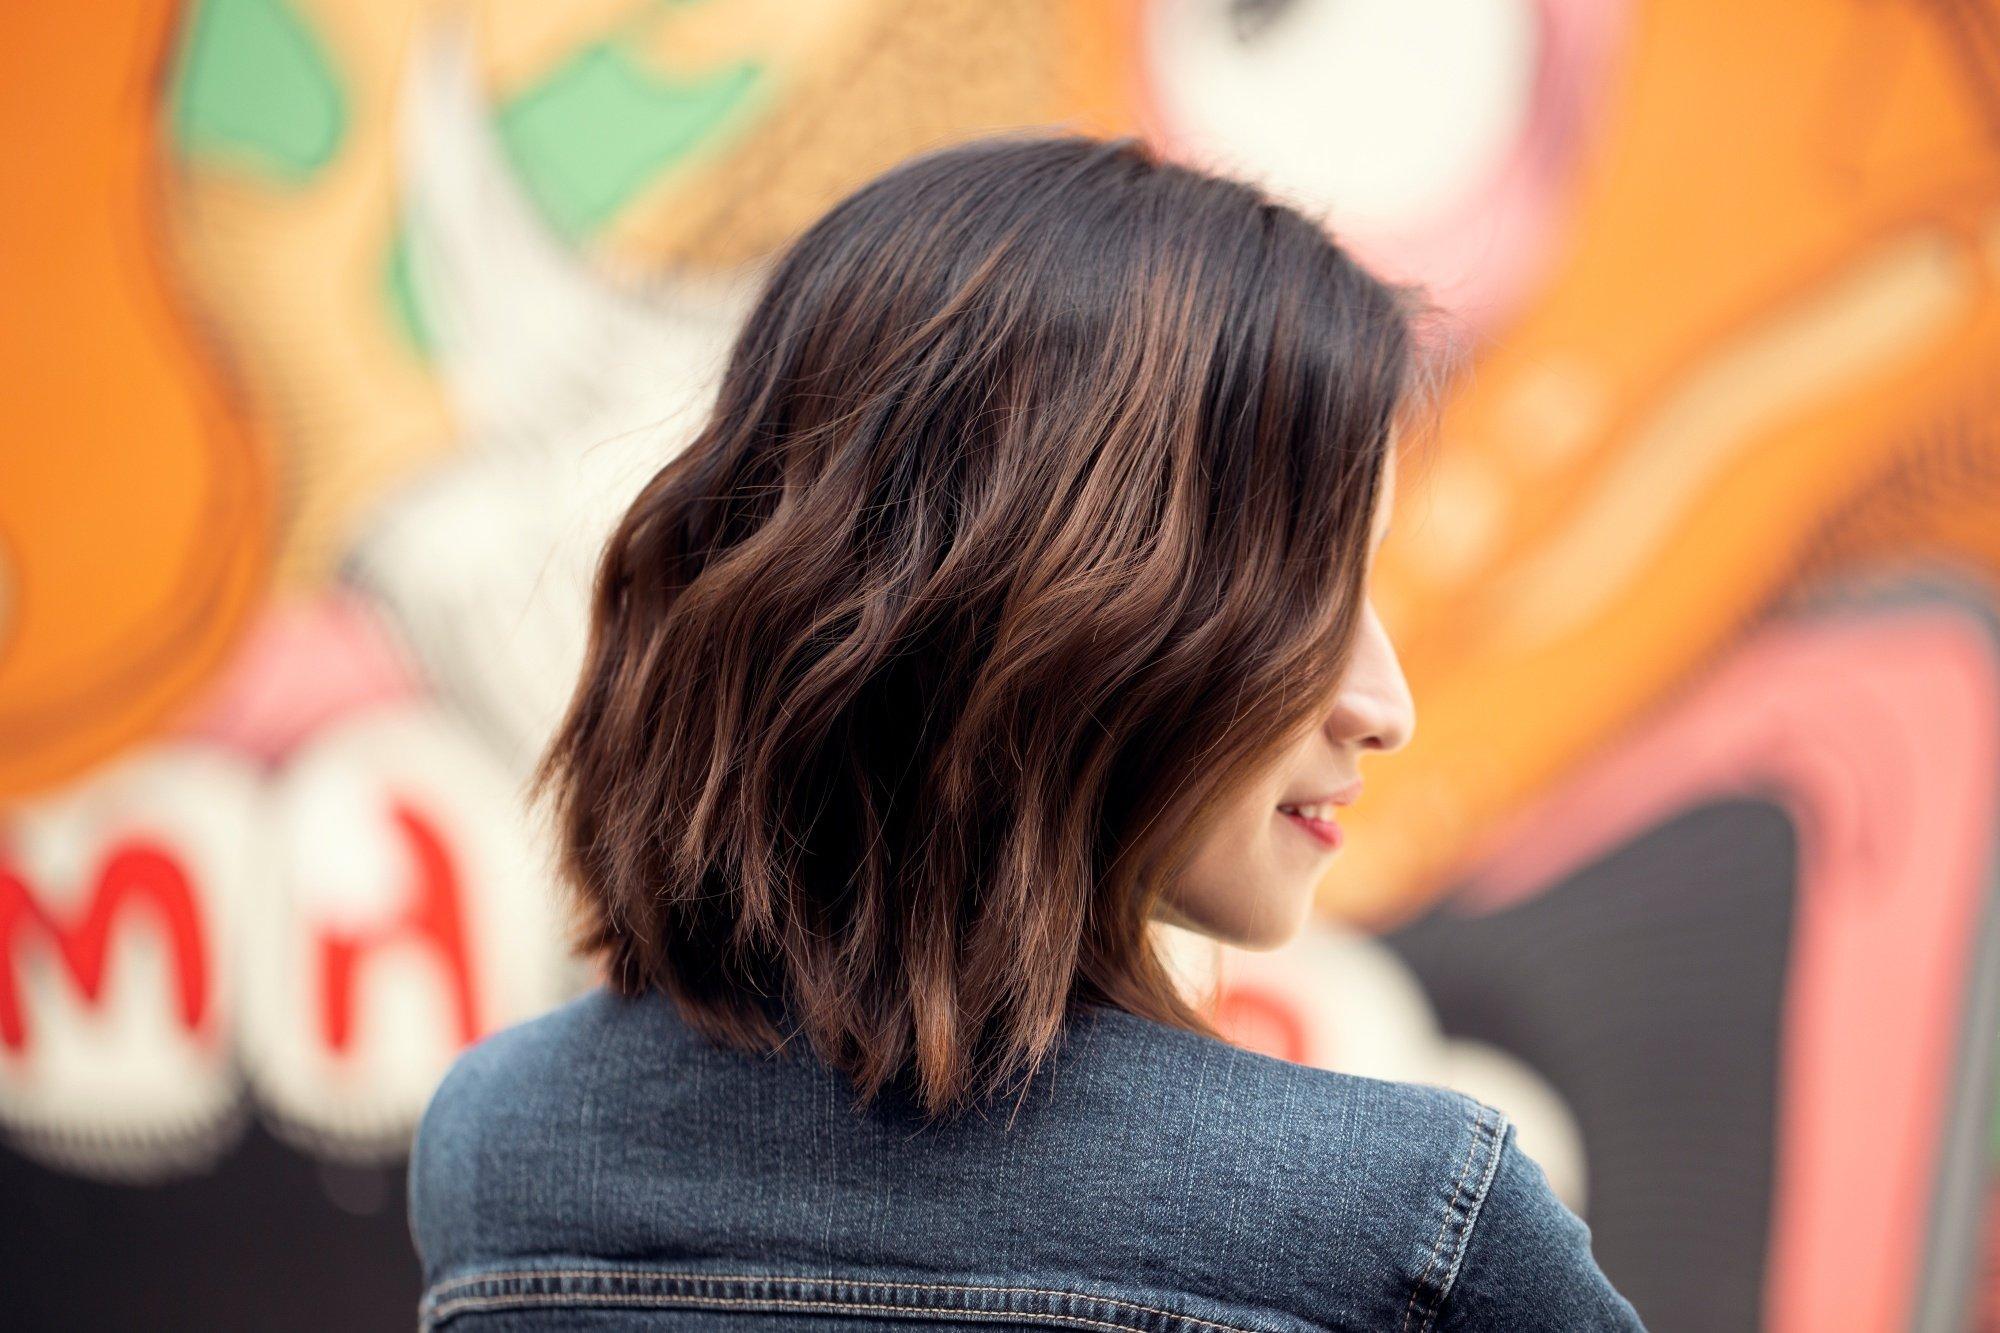 Short wavy hair ideas: Woman with short brown wavy tousled hair